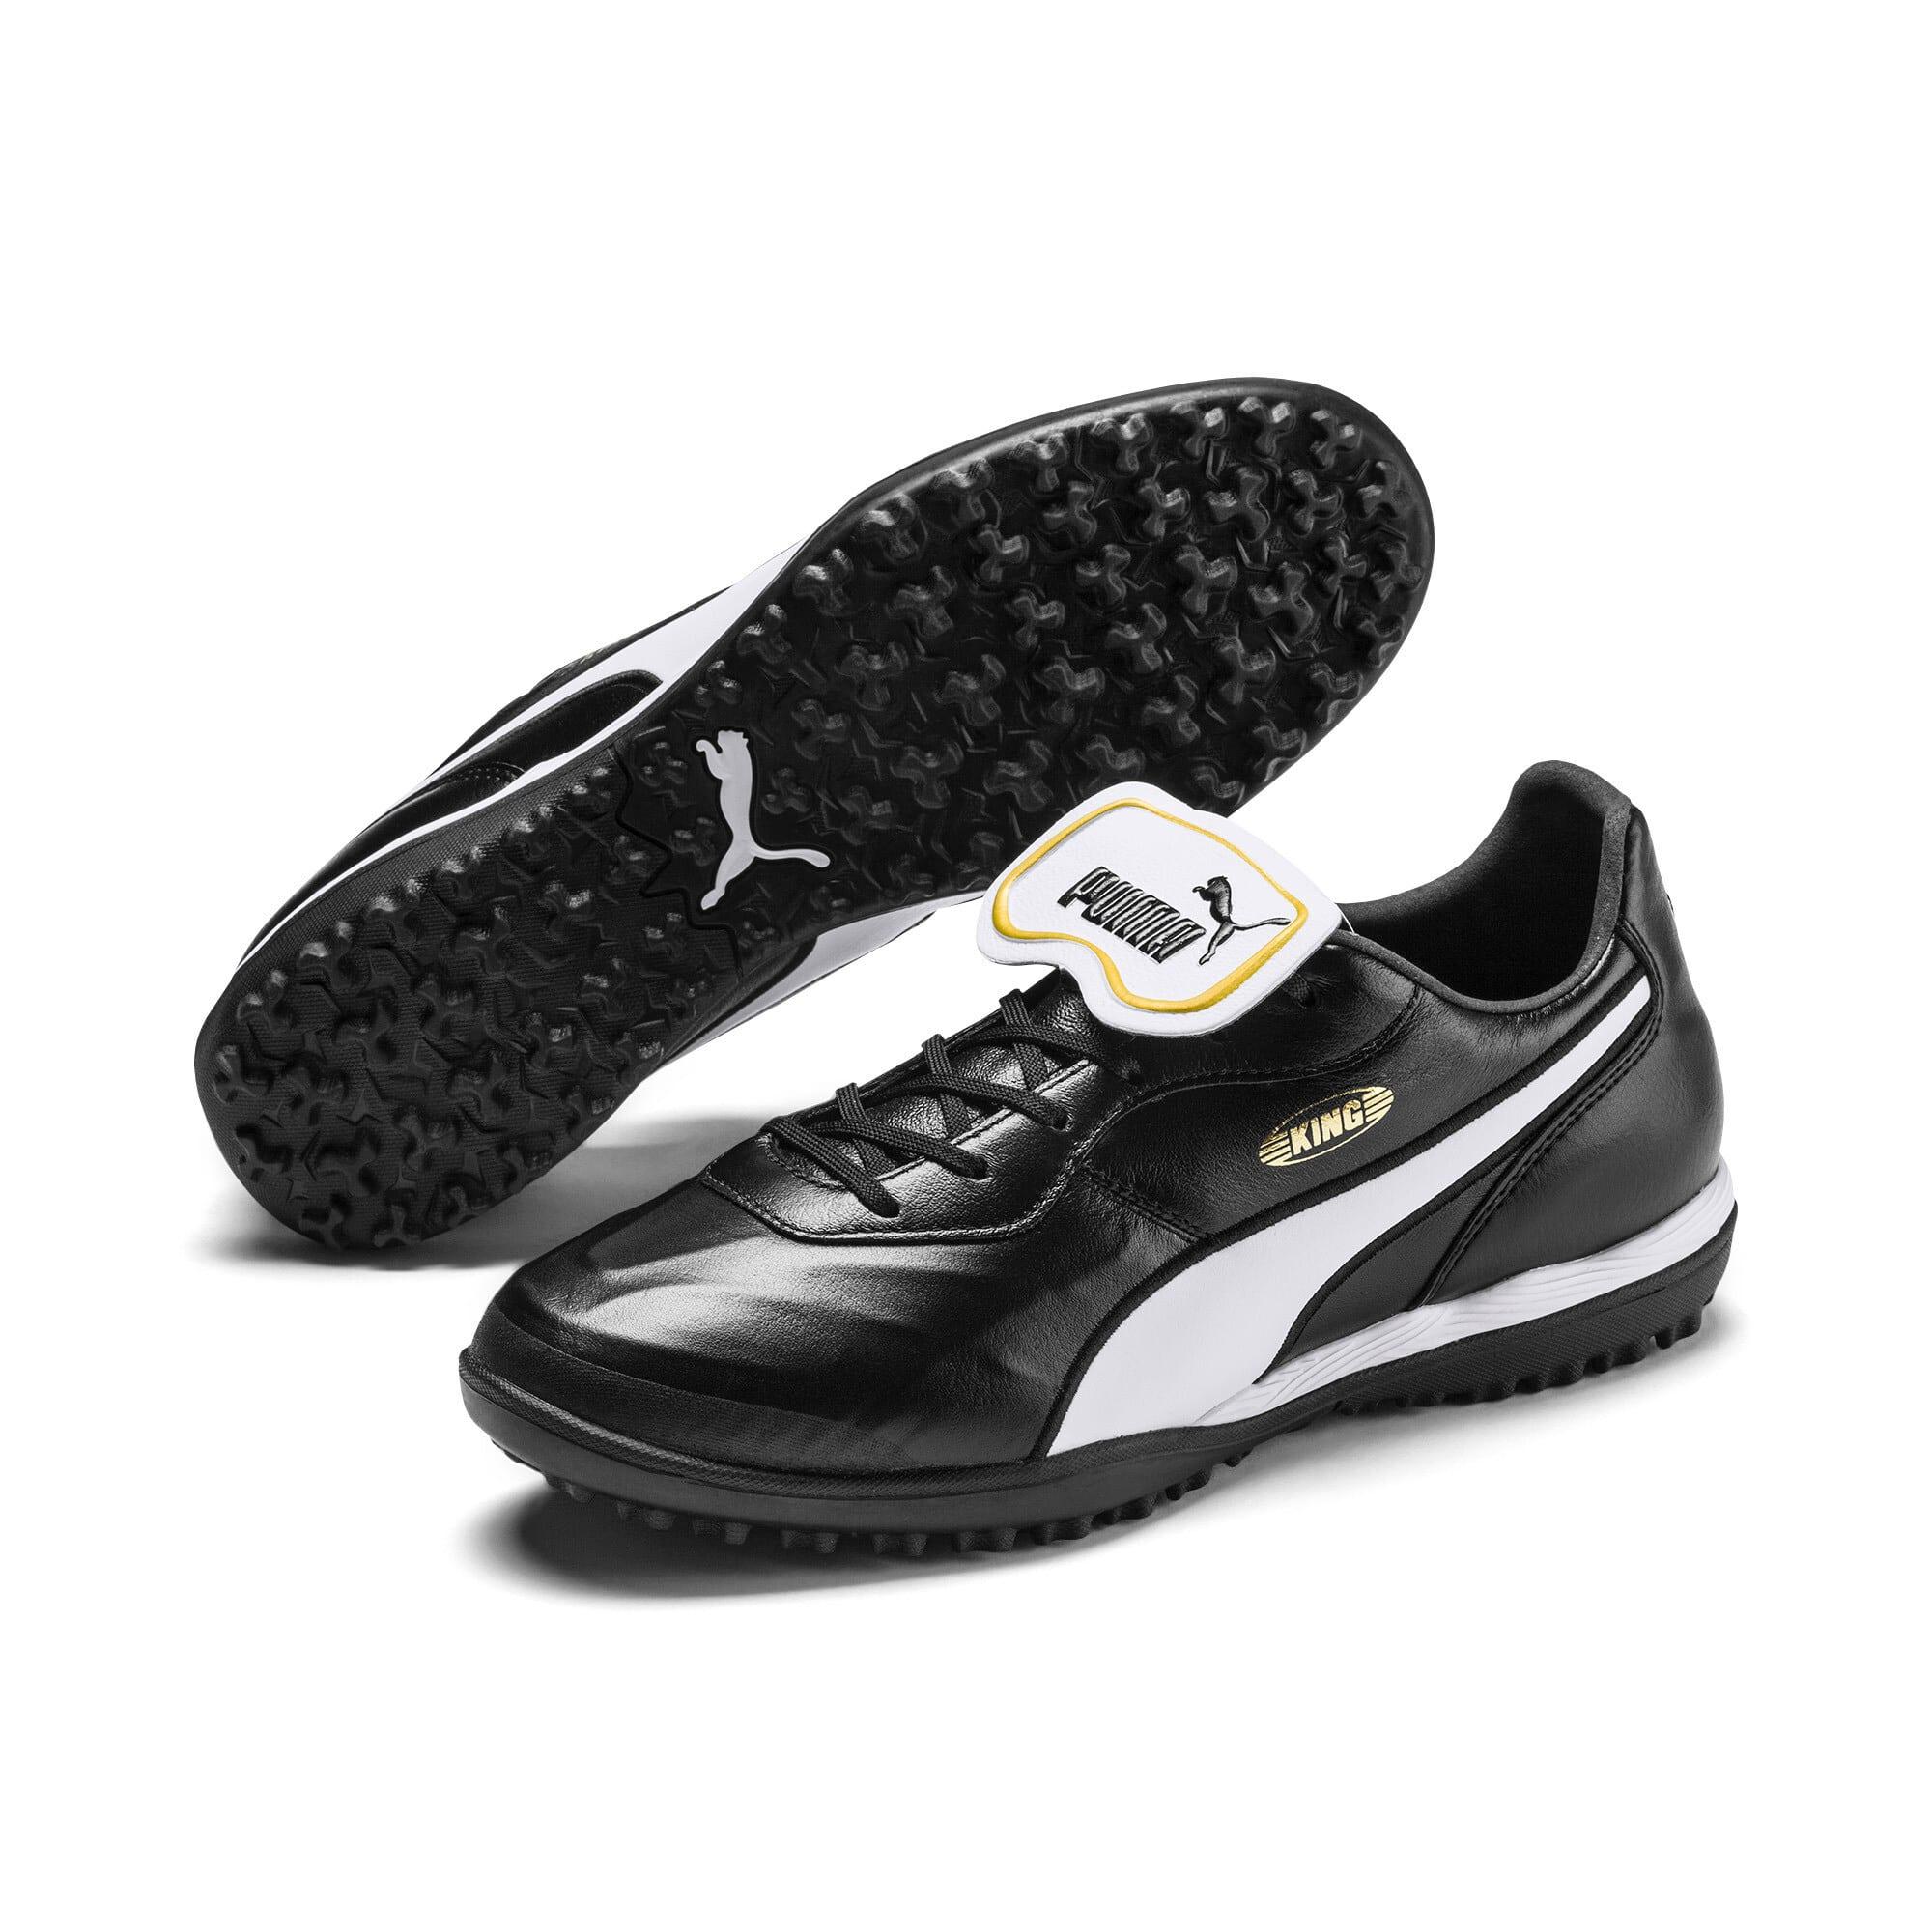 Thumbnail 3 of King Top TT Soccer Shoes, Puma Black-Puma White, medium